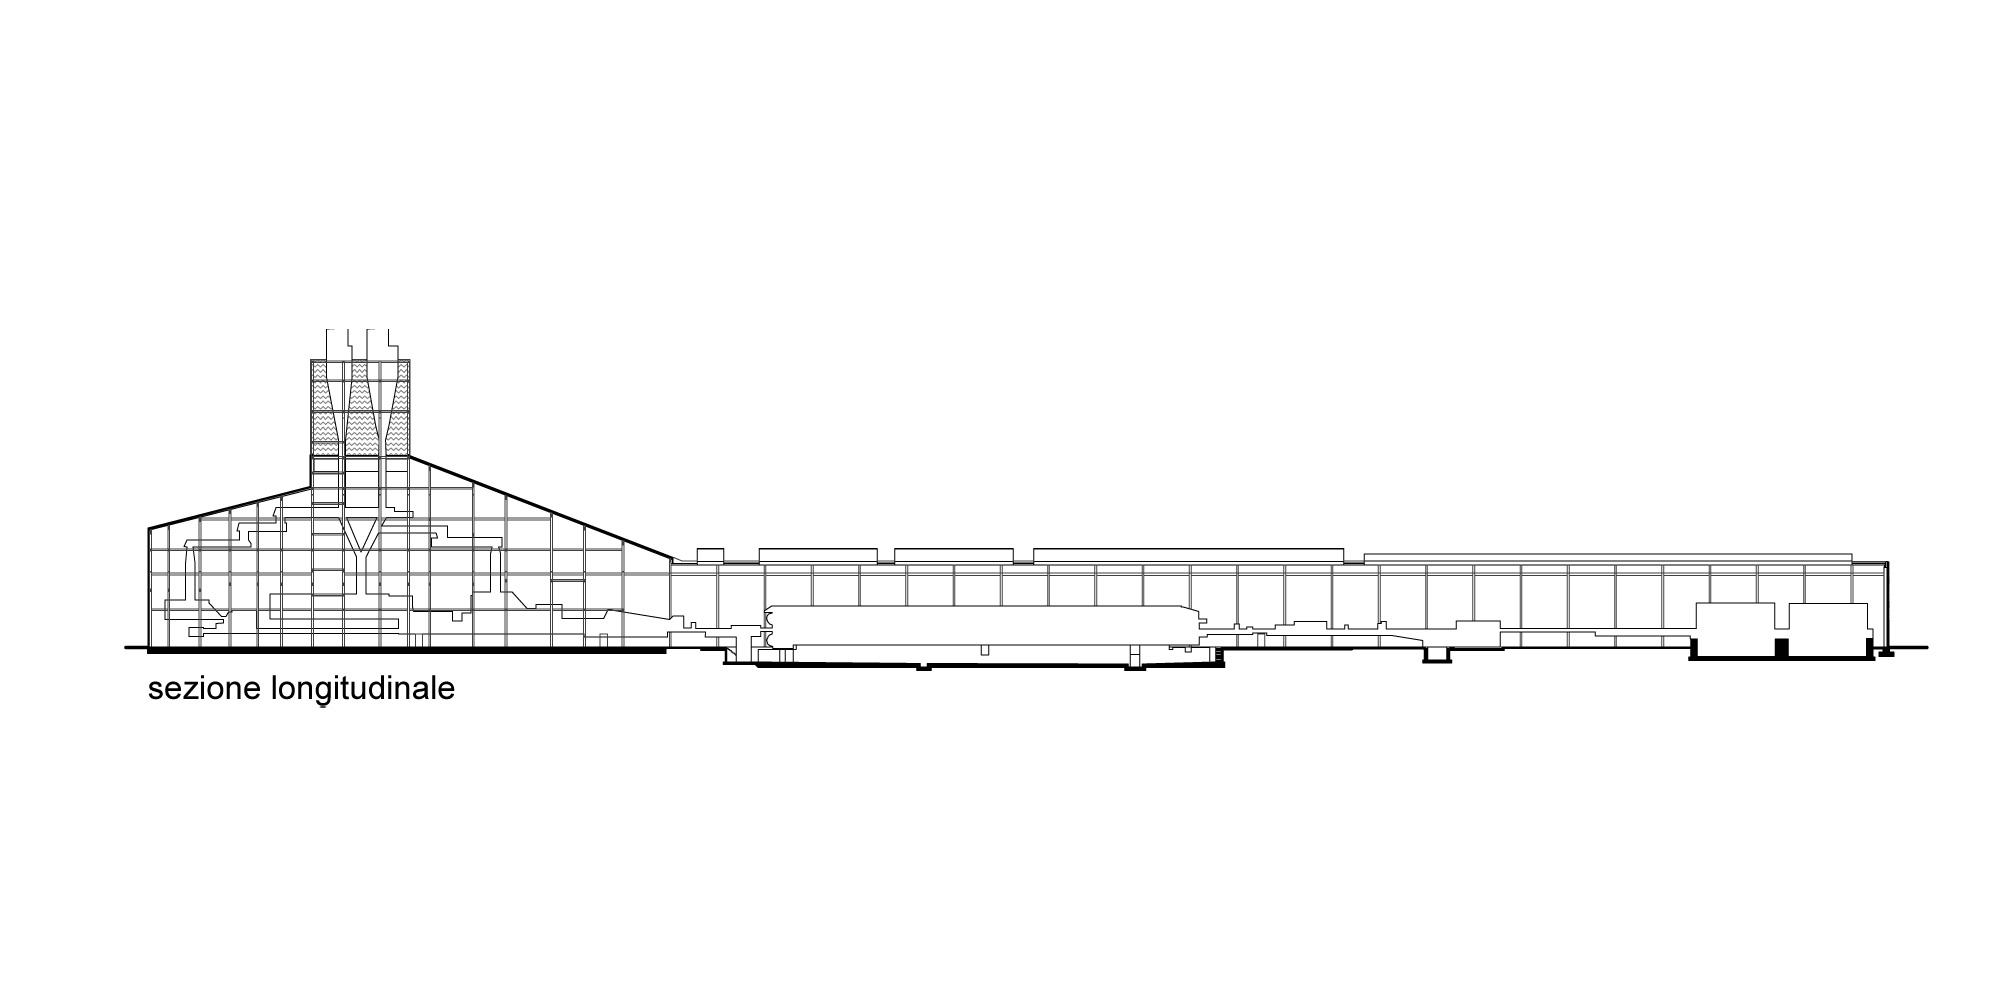 Sezione longitudinale © Valle Architetti Associati